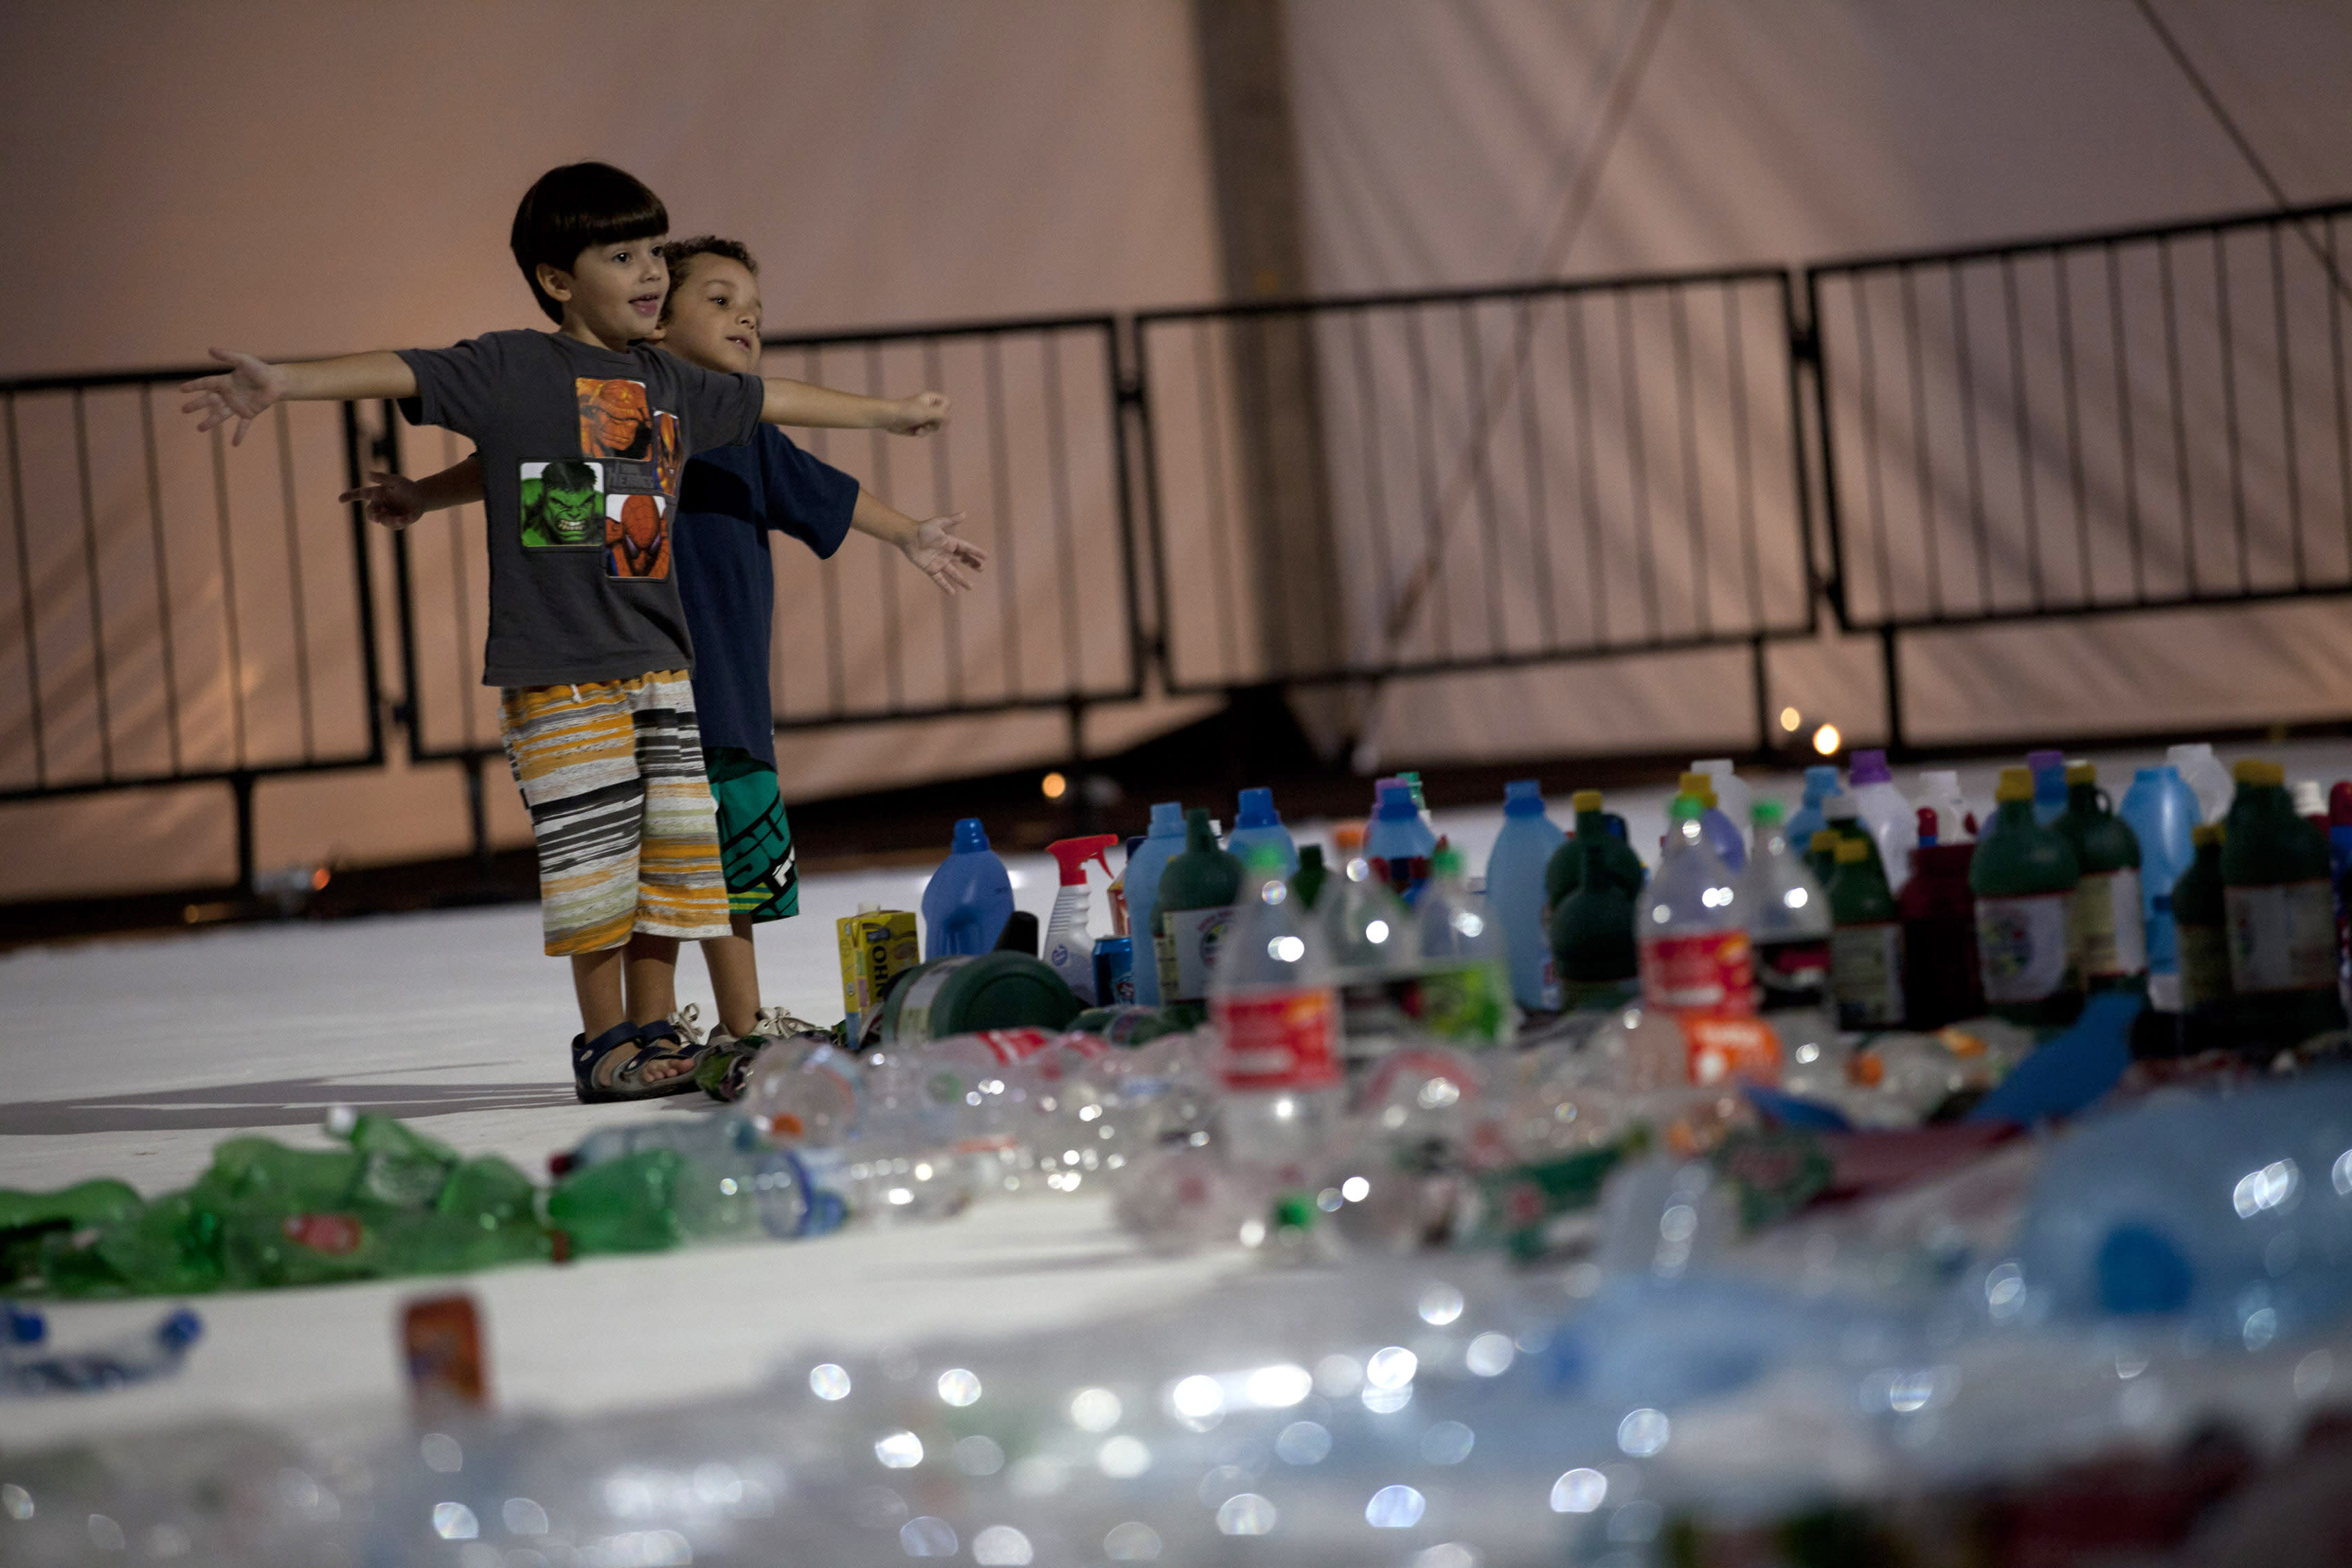 Rio's garbage made into art